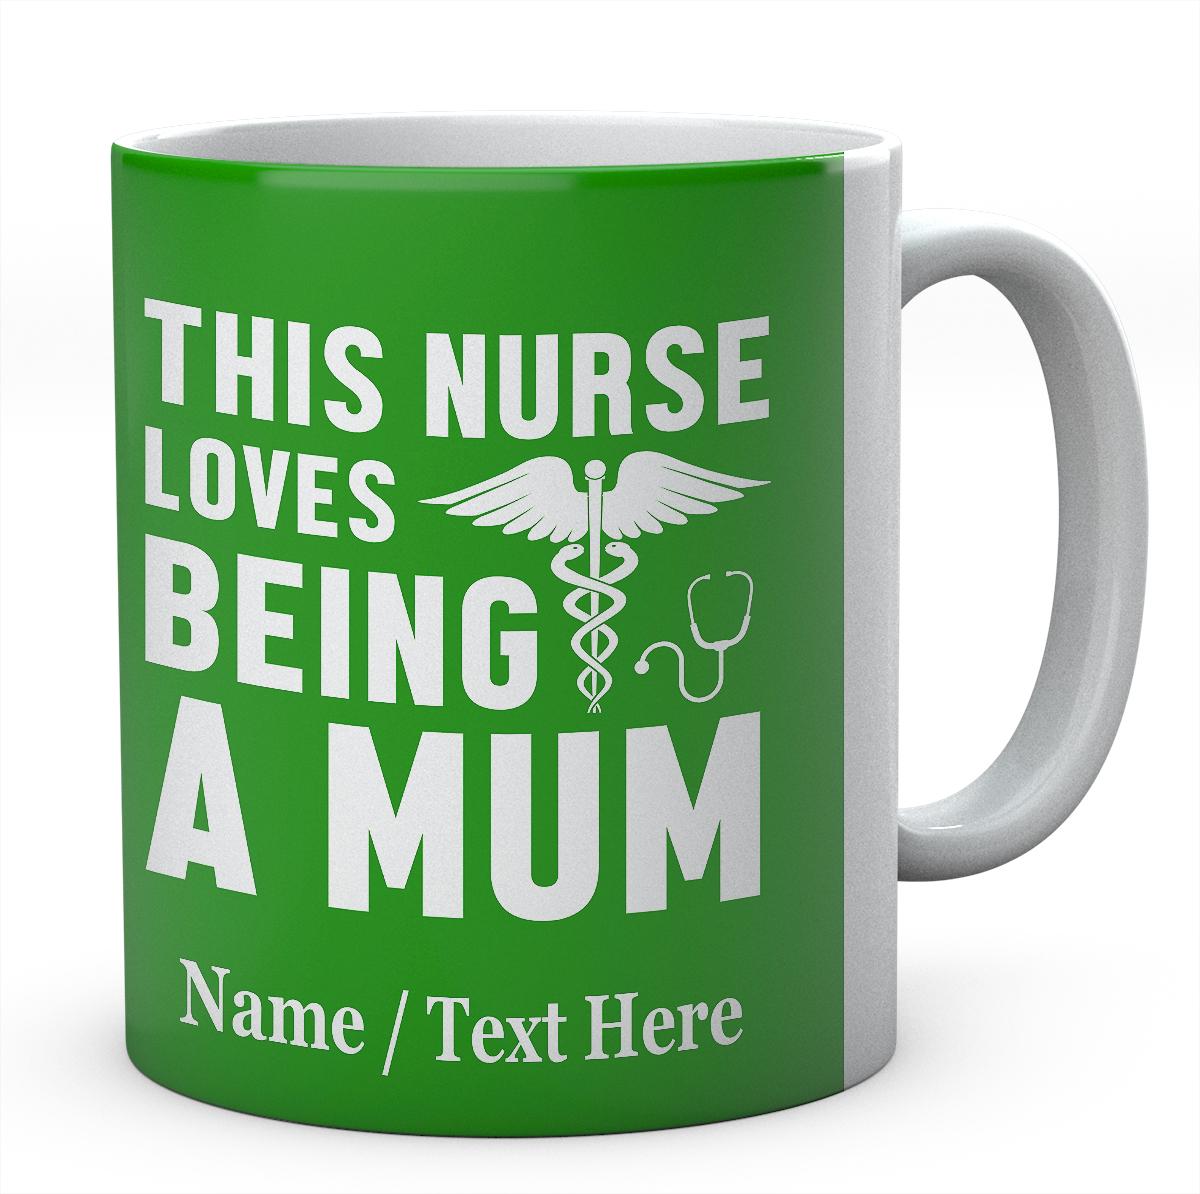 This Nurse Loves Being A Mum-Personalised Mug